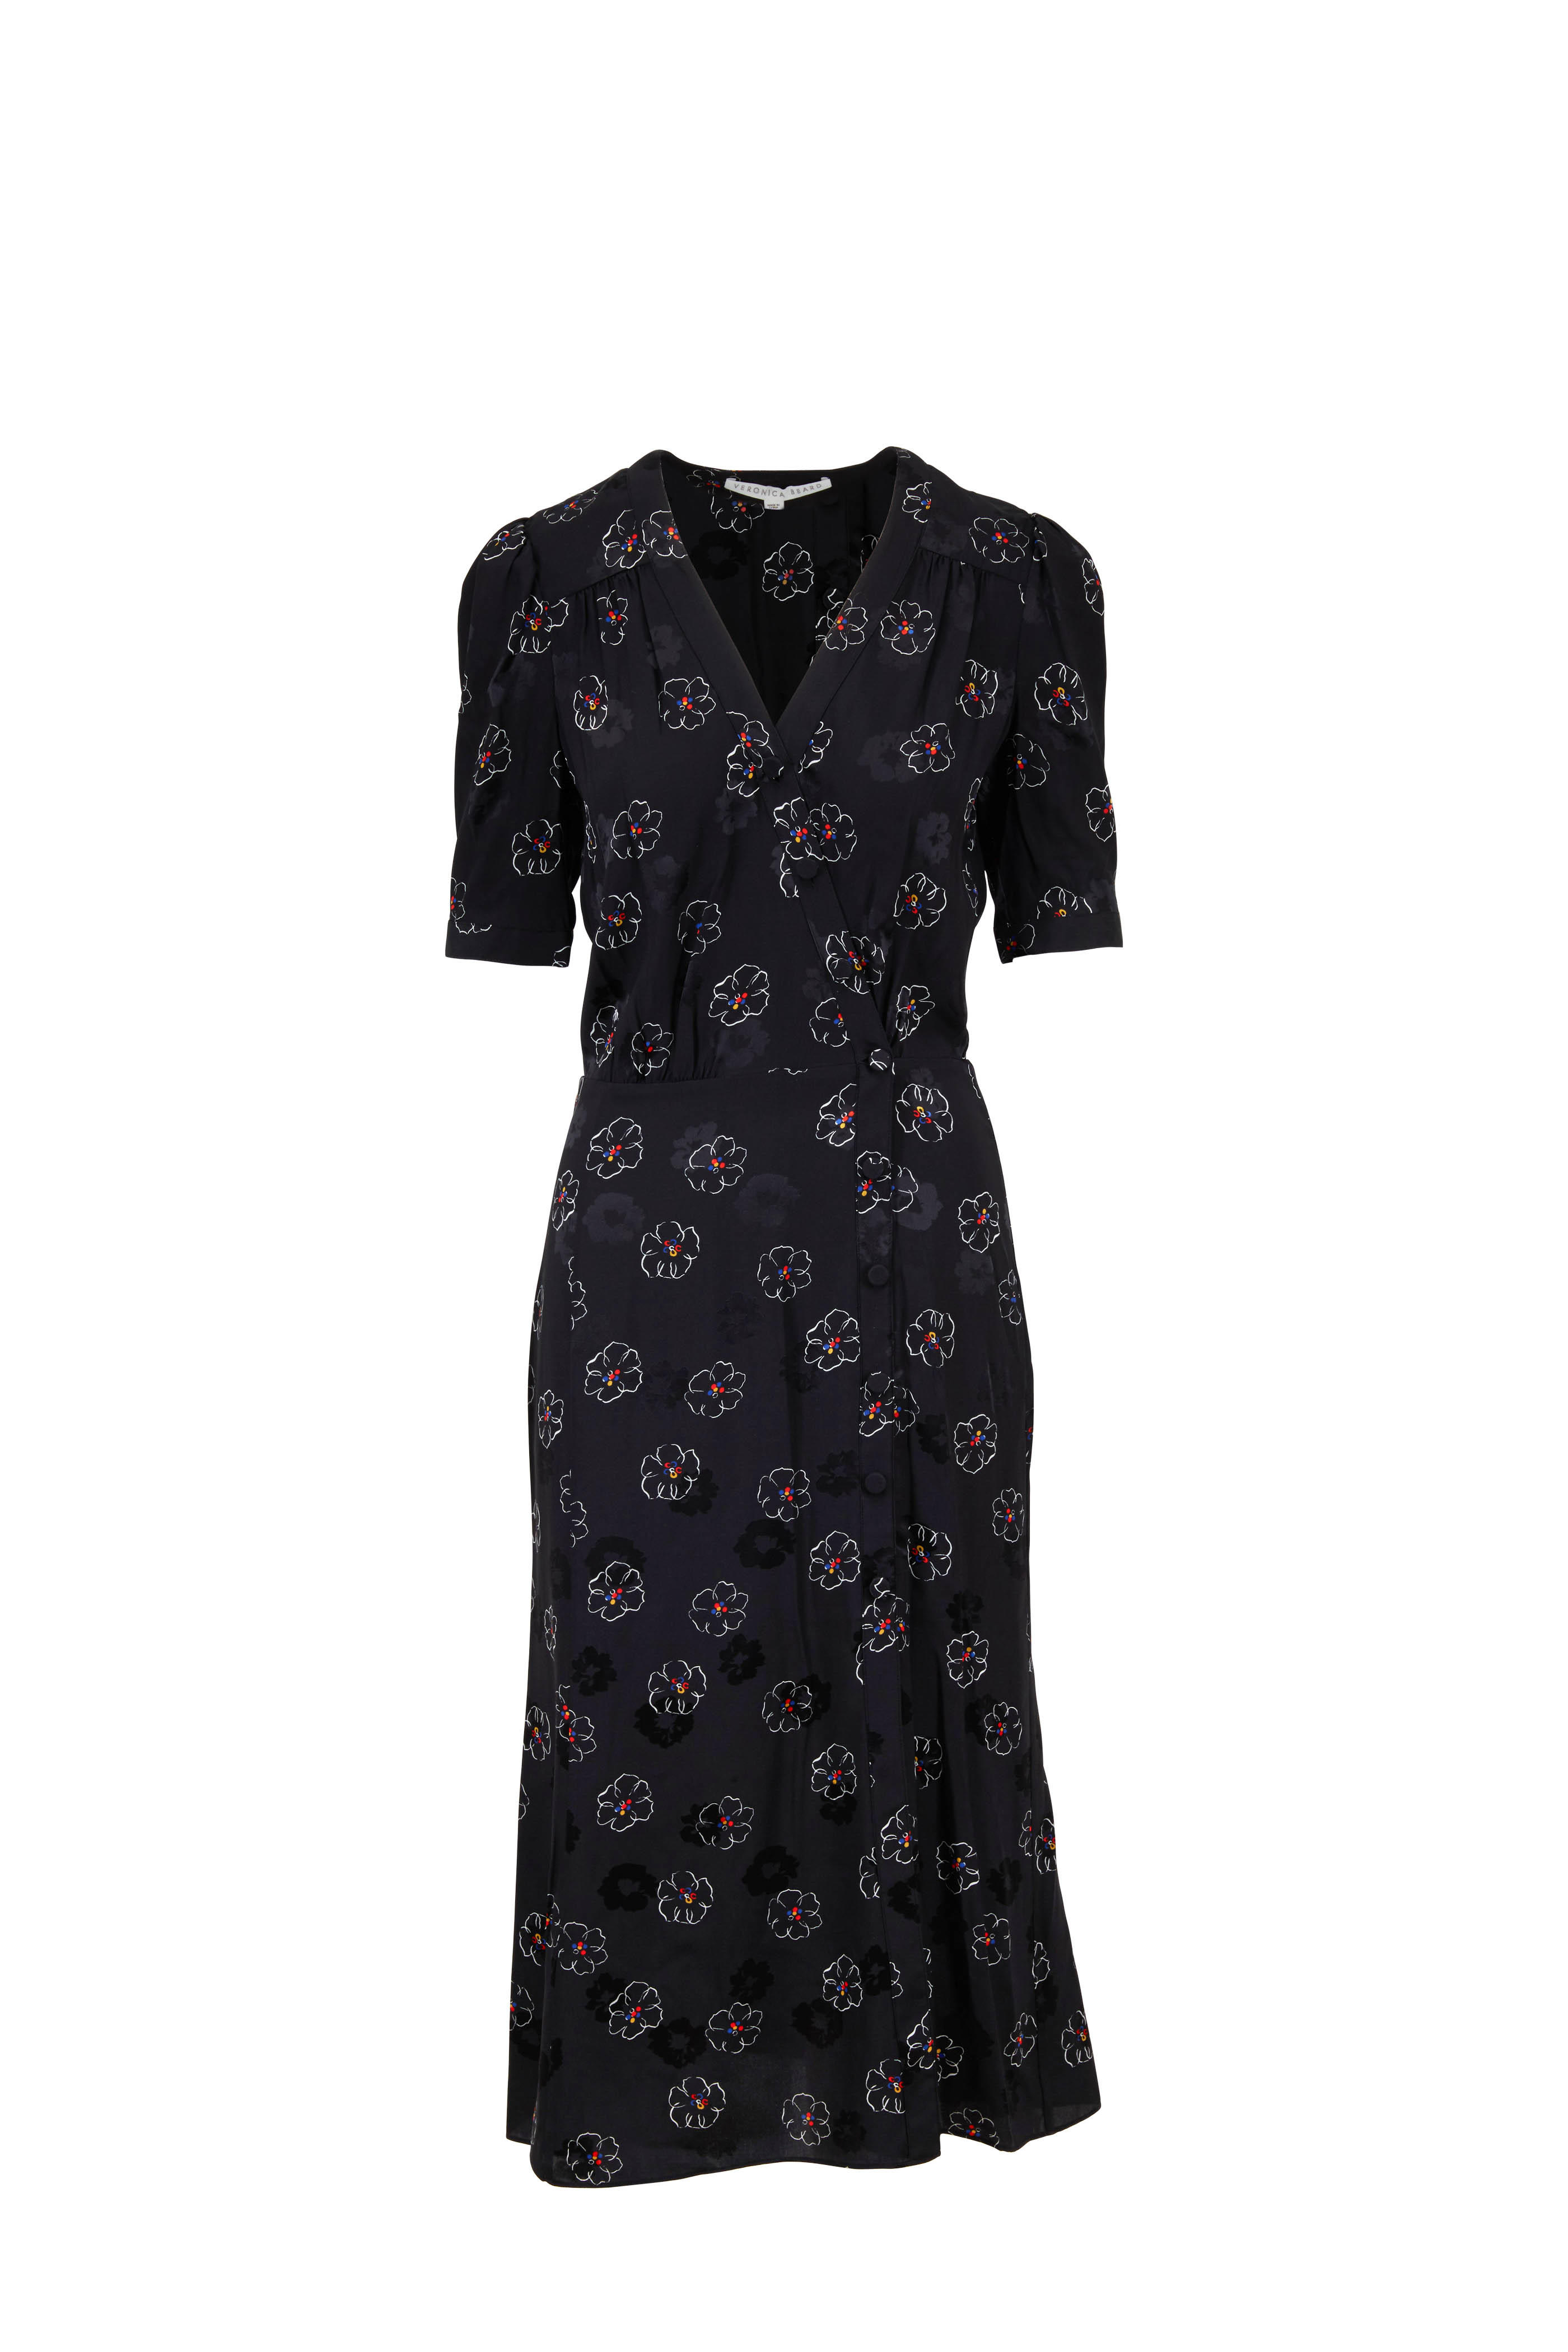 88febe986 Veronica Beard - Mika Black Floral Print Elbow Sleeve Midi Dress ...